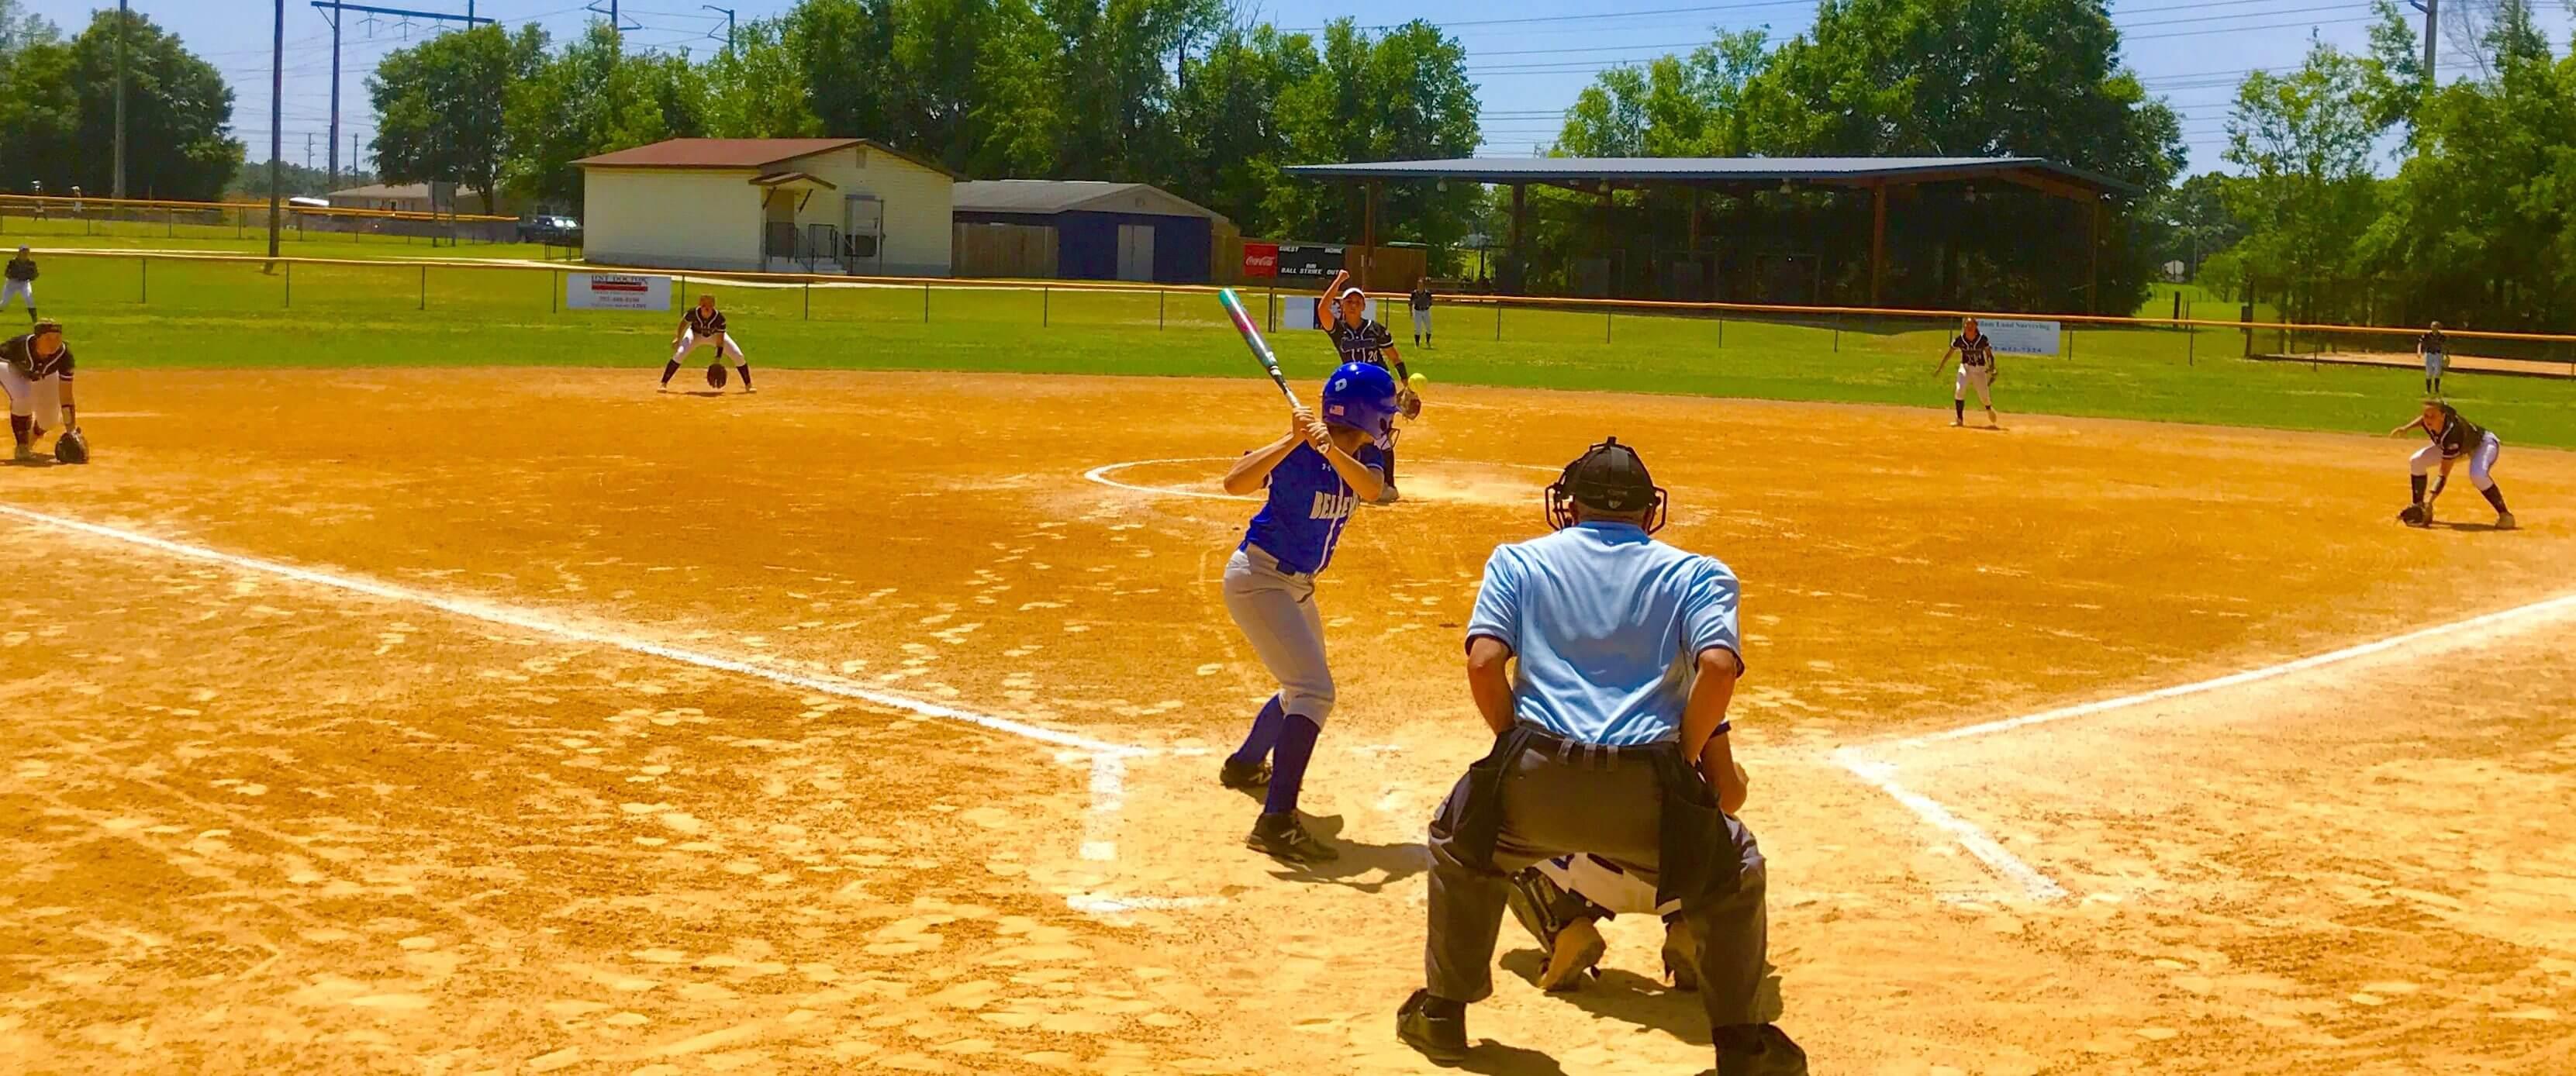 Doc4Life Softball Tournament (Ocala, Fla ): Photos from Day